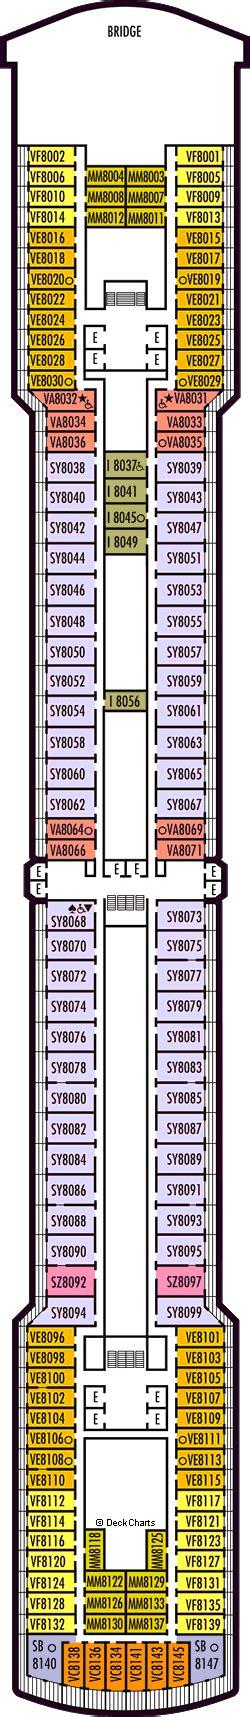 Westerdam holland america deck plan Image